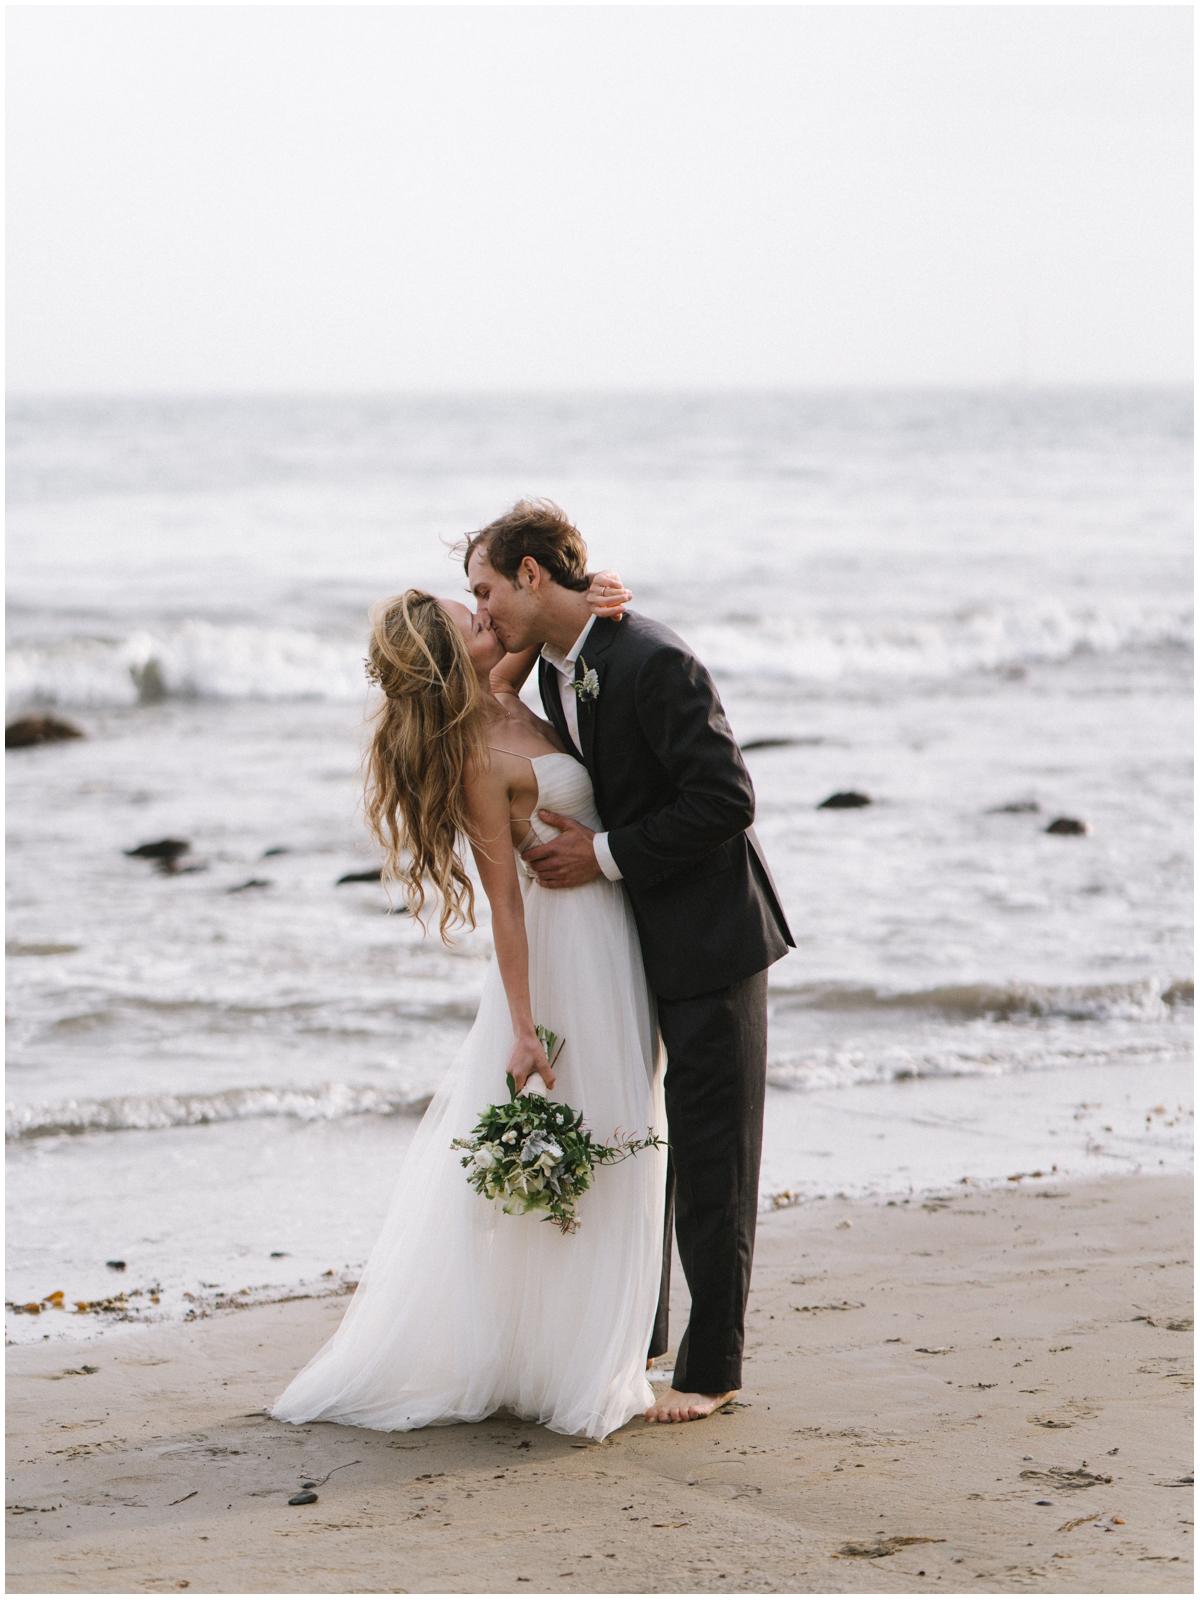 Santa Babara Elopement Wedding Photographer - Pinnel Photography-01-18.jpg